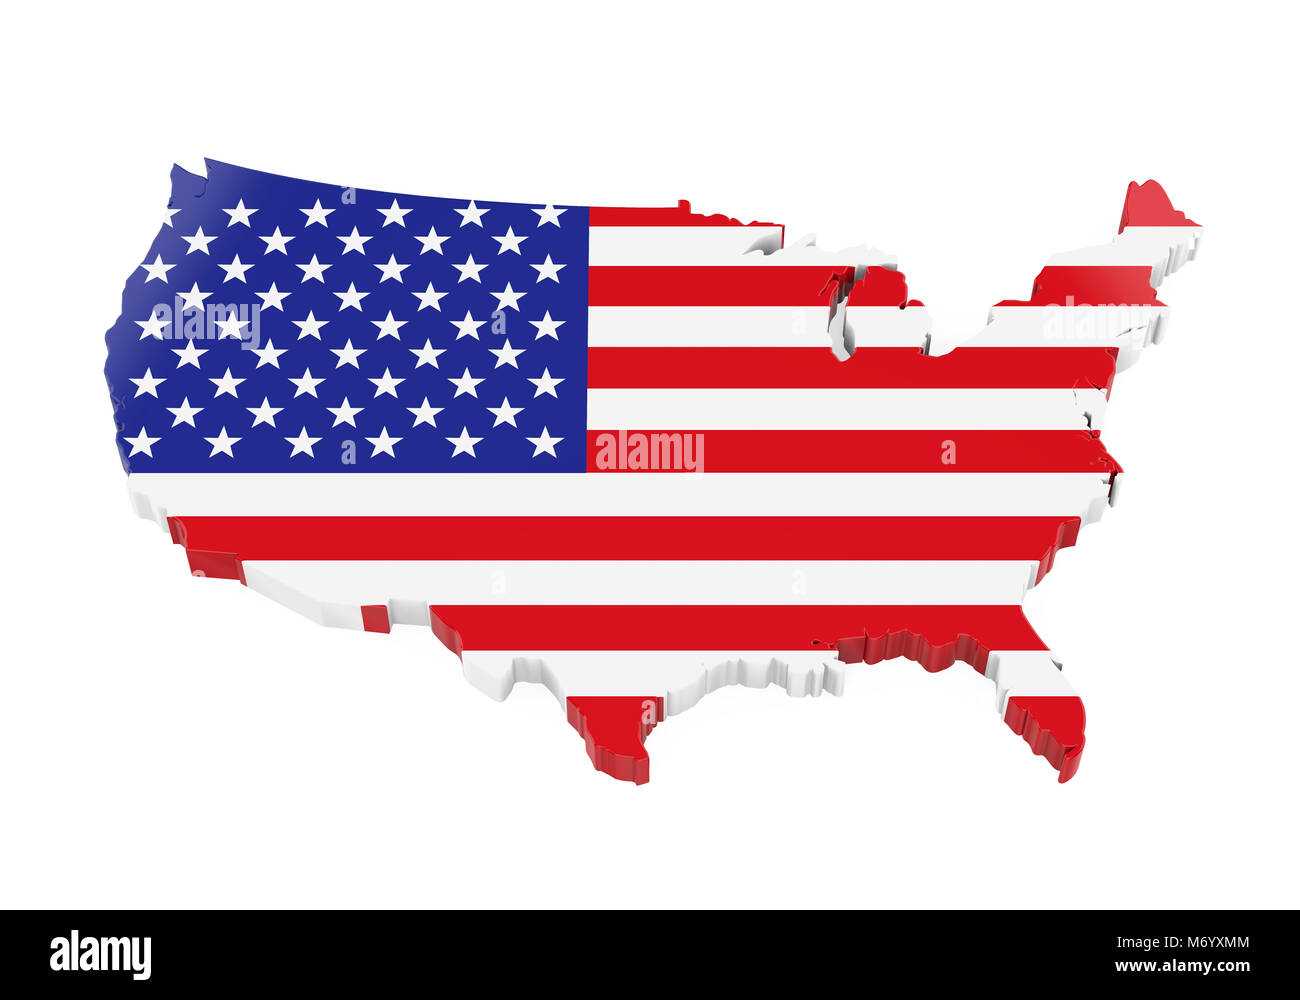 United States of America Map Flag Stock Photo: 176405284 - Alamy